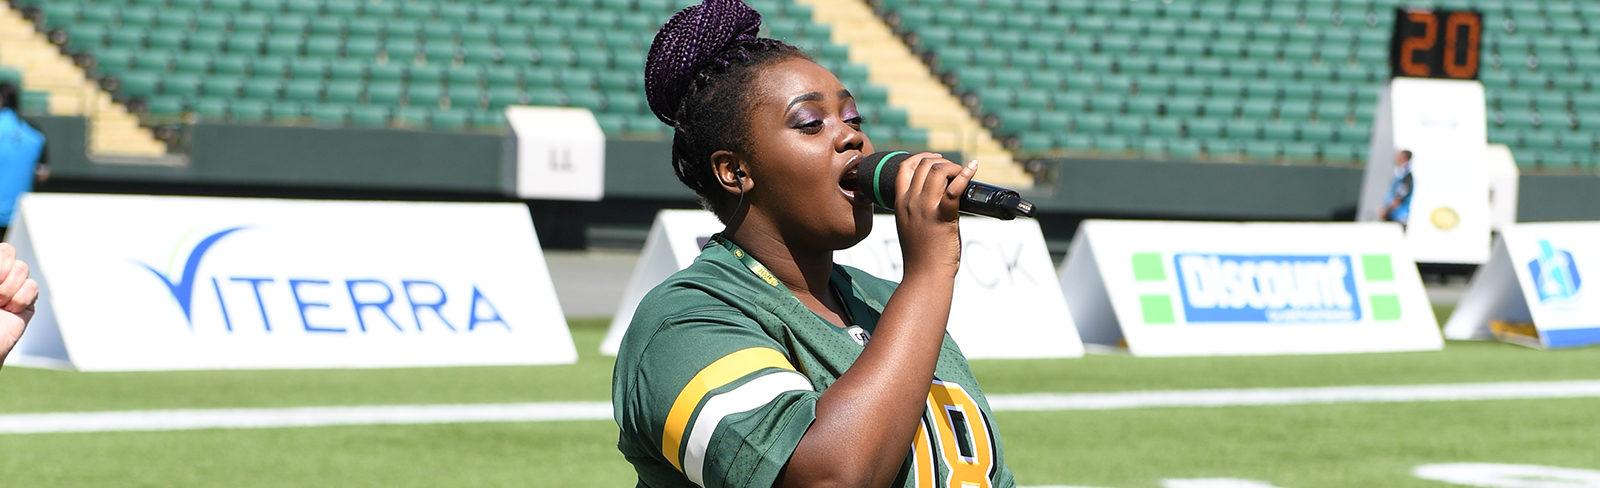 Eskimos Anthem Singer Shines Like CFL's Diversity Is Strength